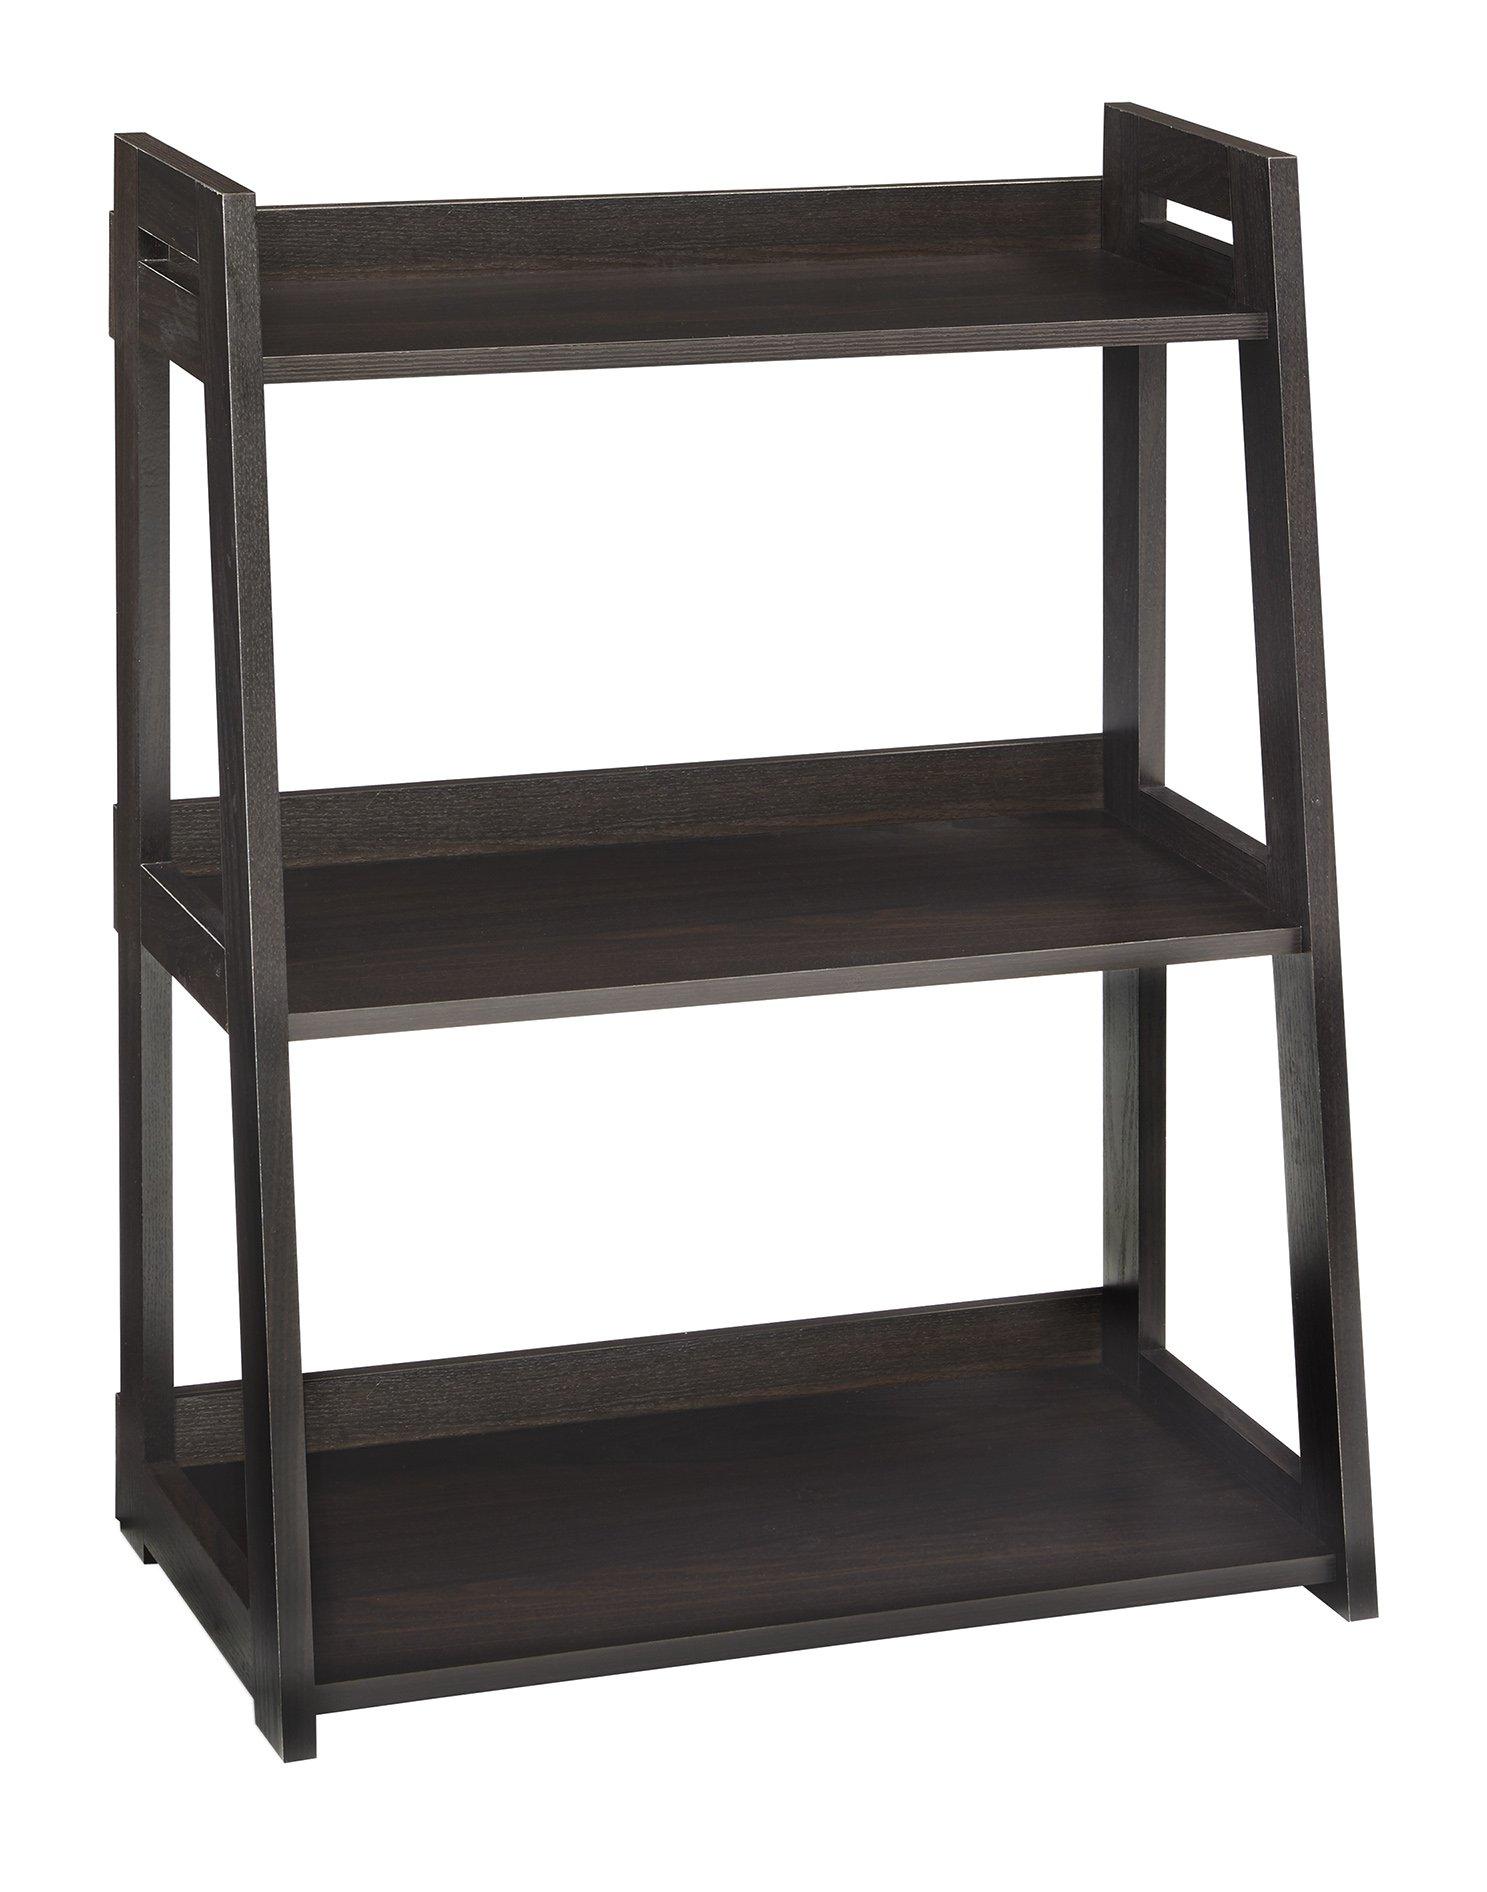 ClosetMaid 3312 No-Tool Assembly Ladder Shelf, Wide 3-Tier, Black Walnut